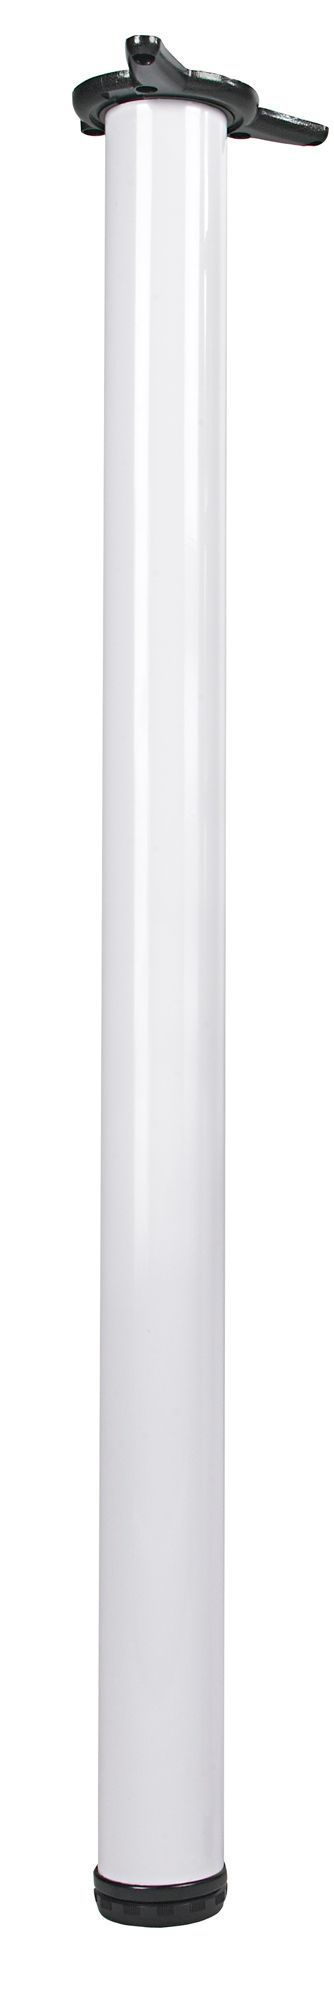 Rothley (h)870mm White Worktop Support Leg